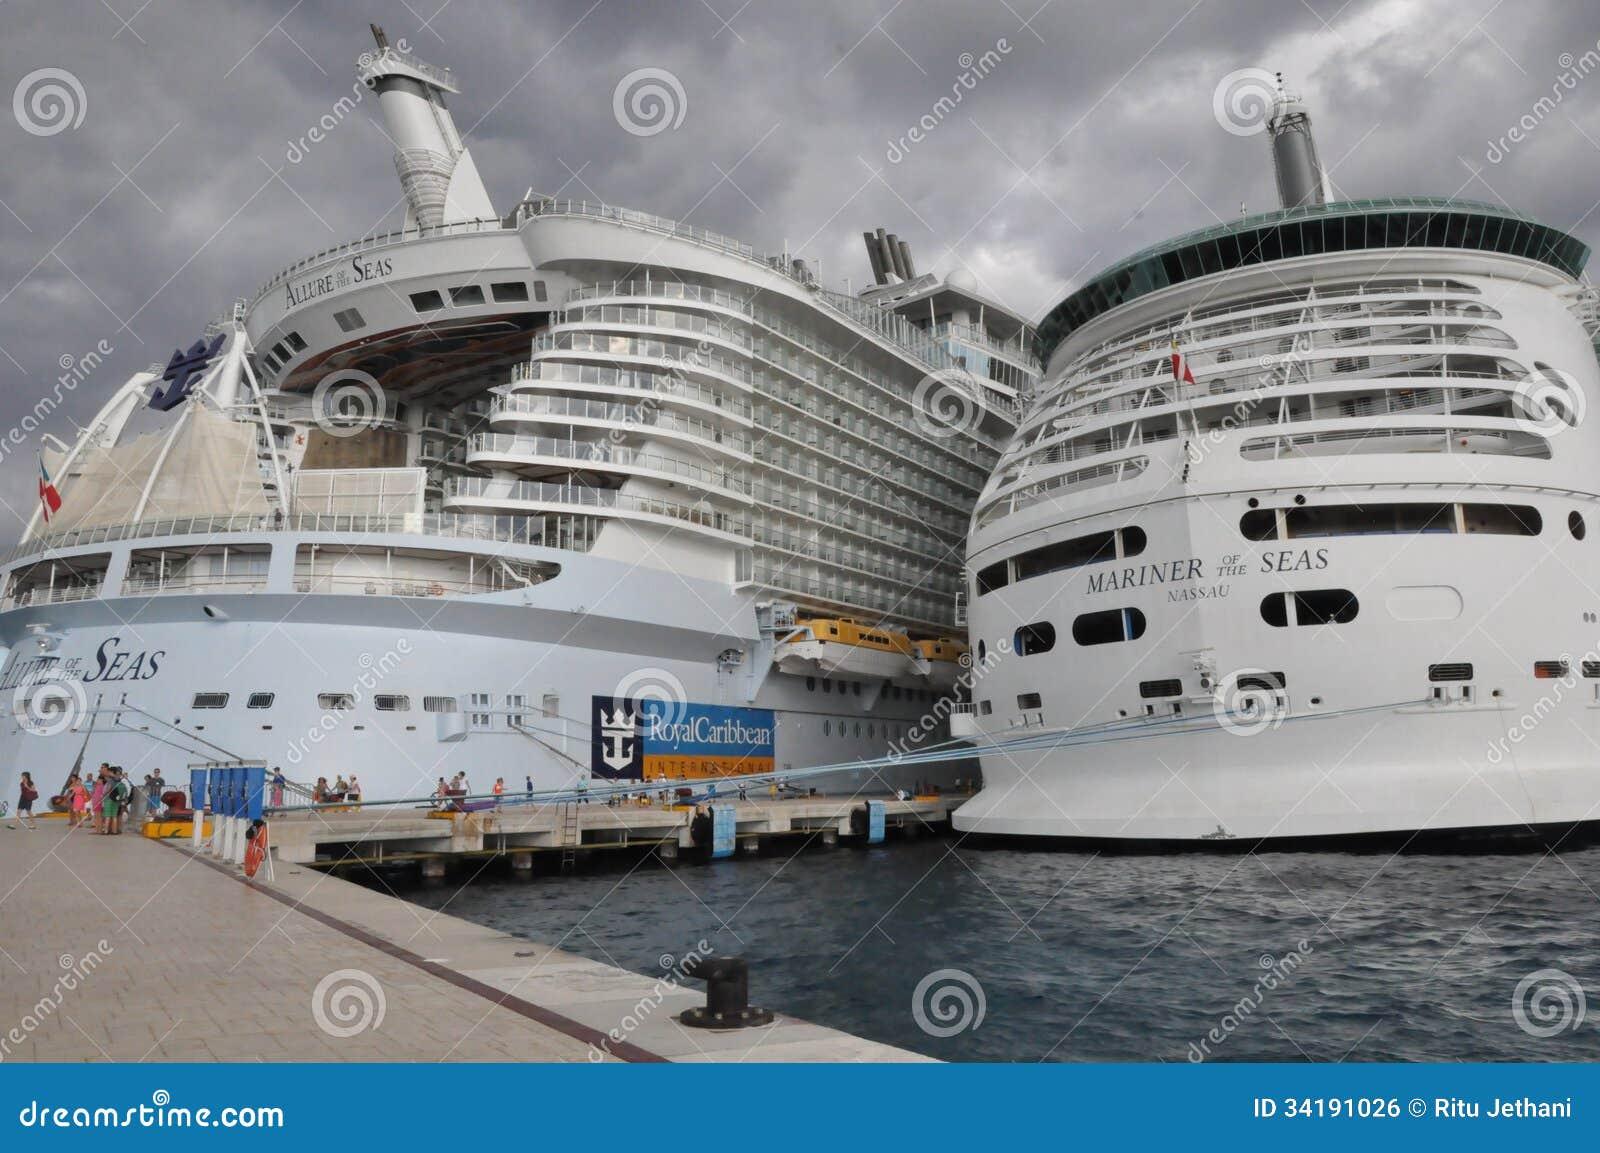 Royal Caribbean's Allure Of The Seas & Mariner Of The Seas ... Oasis Of The Seas Comparison